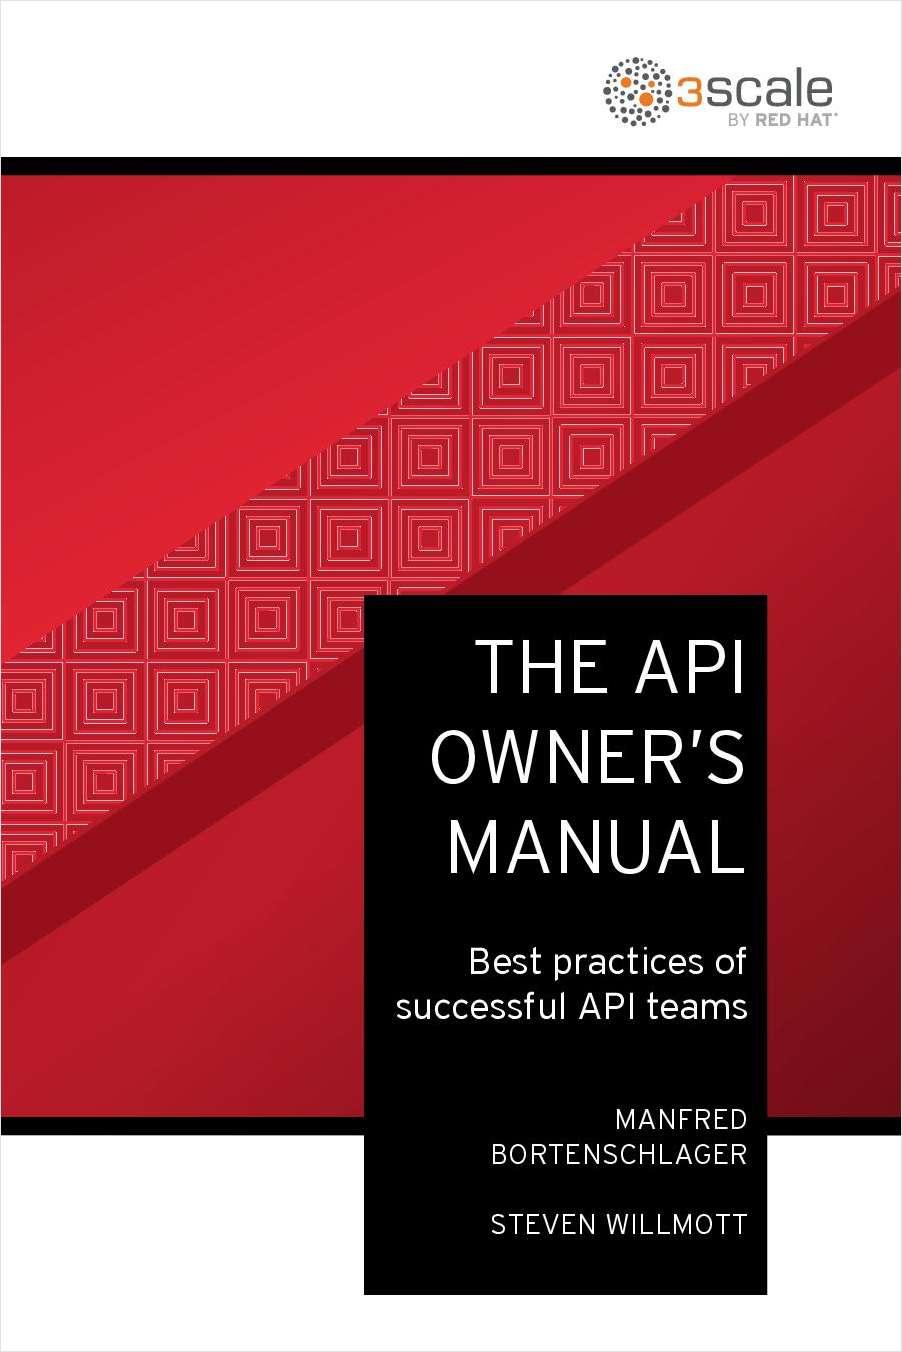 The API Owner's Manual